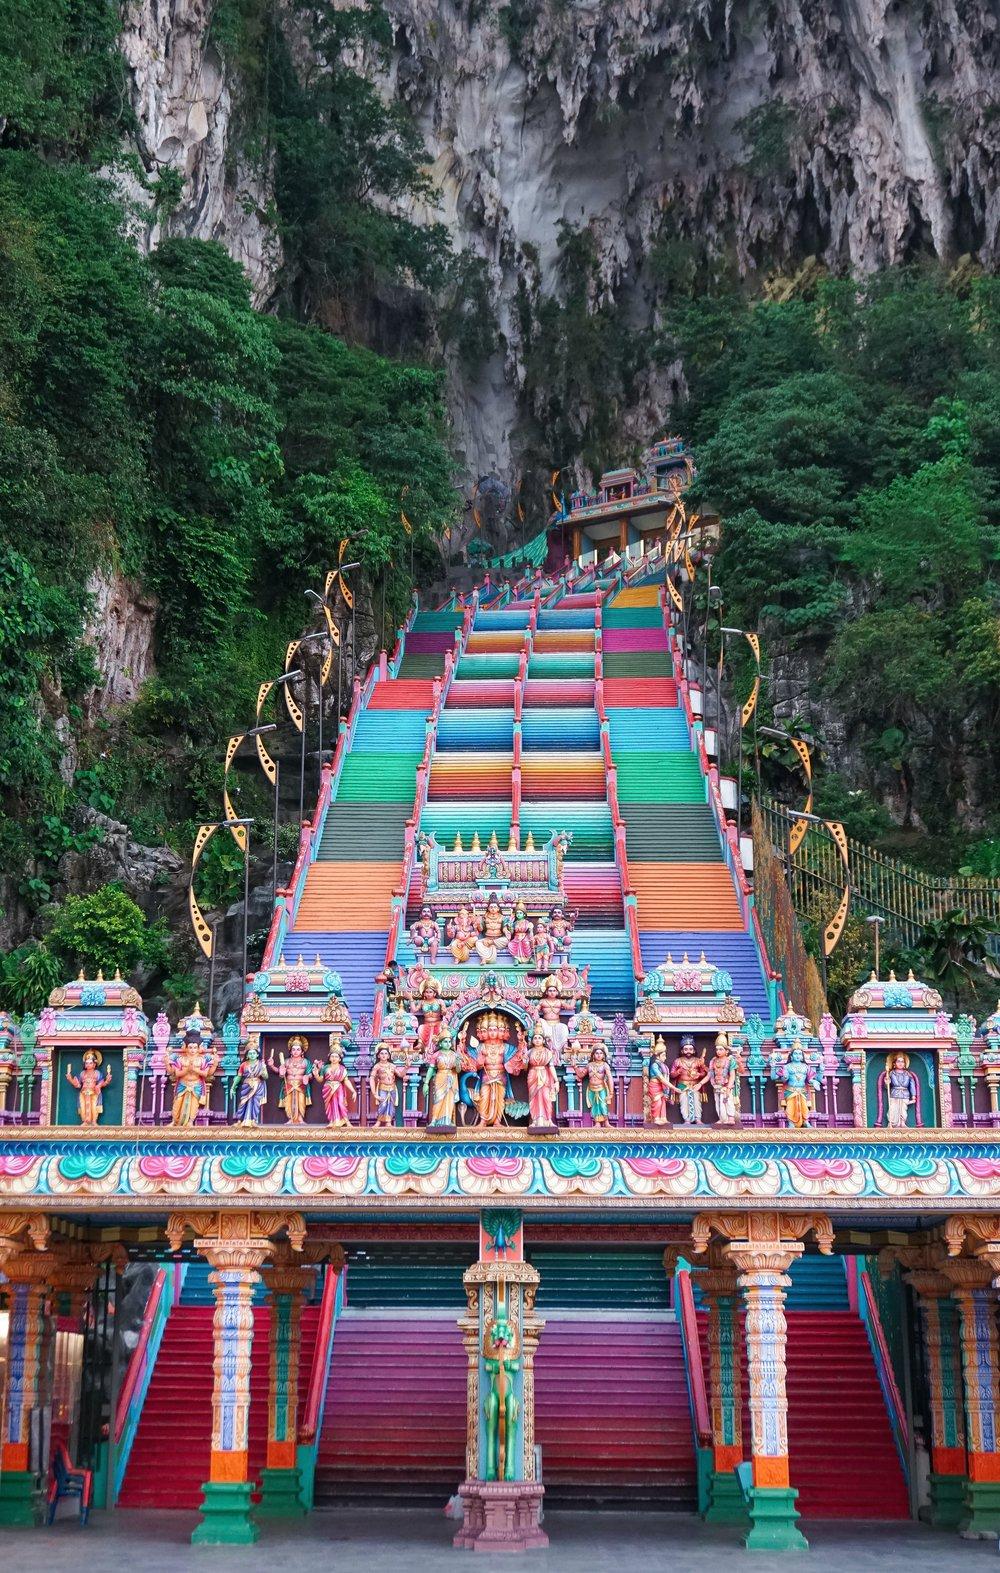 curio.trips.malaysia.kuala.lumpur.colourful.stairway.portrait.jpg